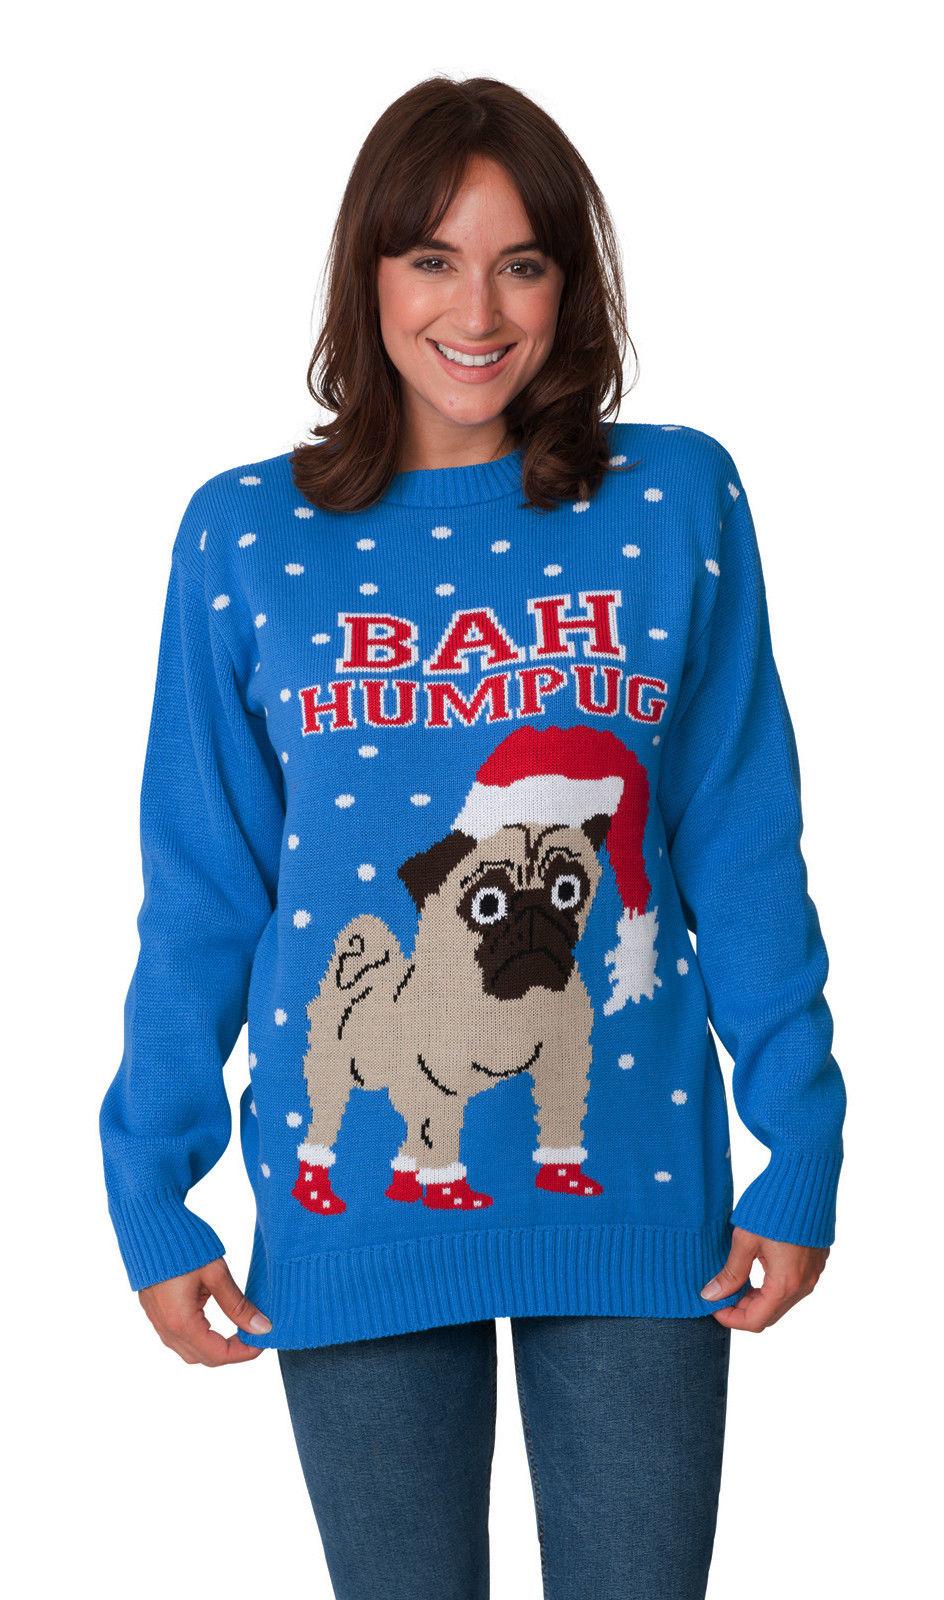 Bah Humpug vánoční svetr empty 1a94ad99e9